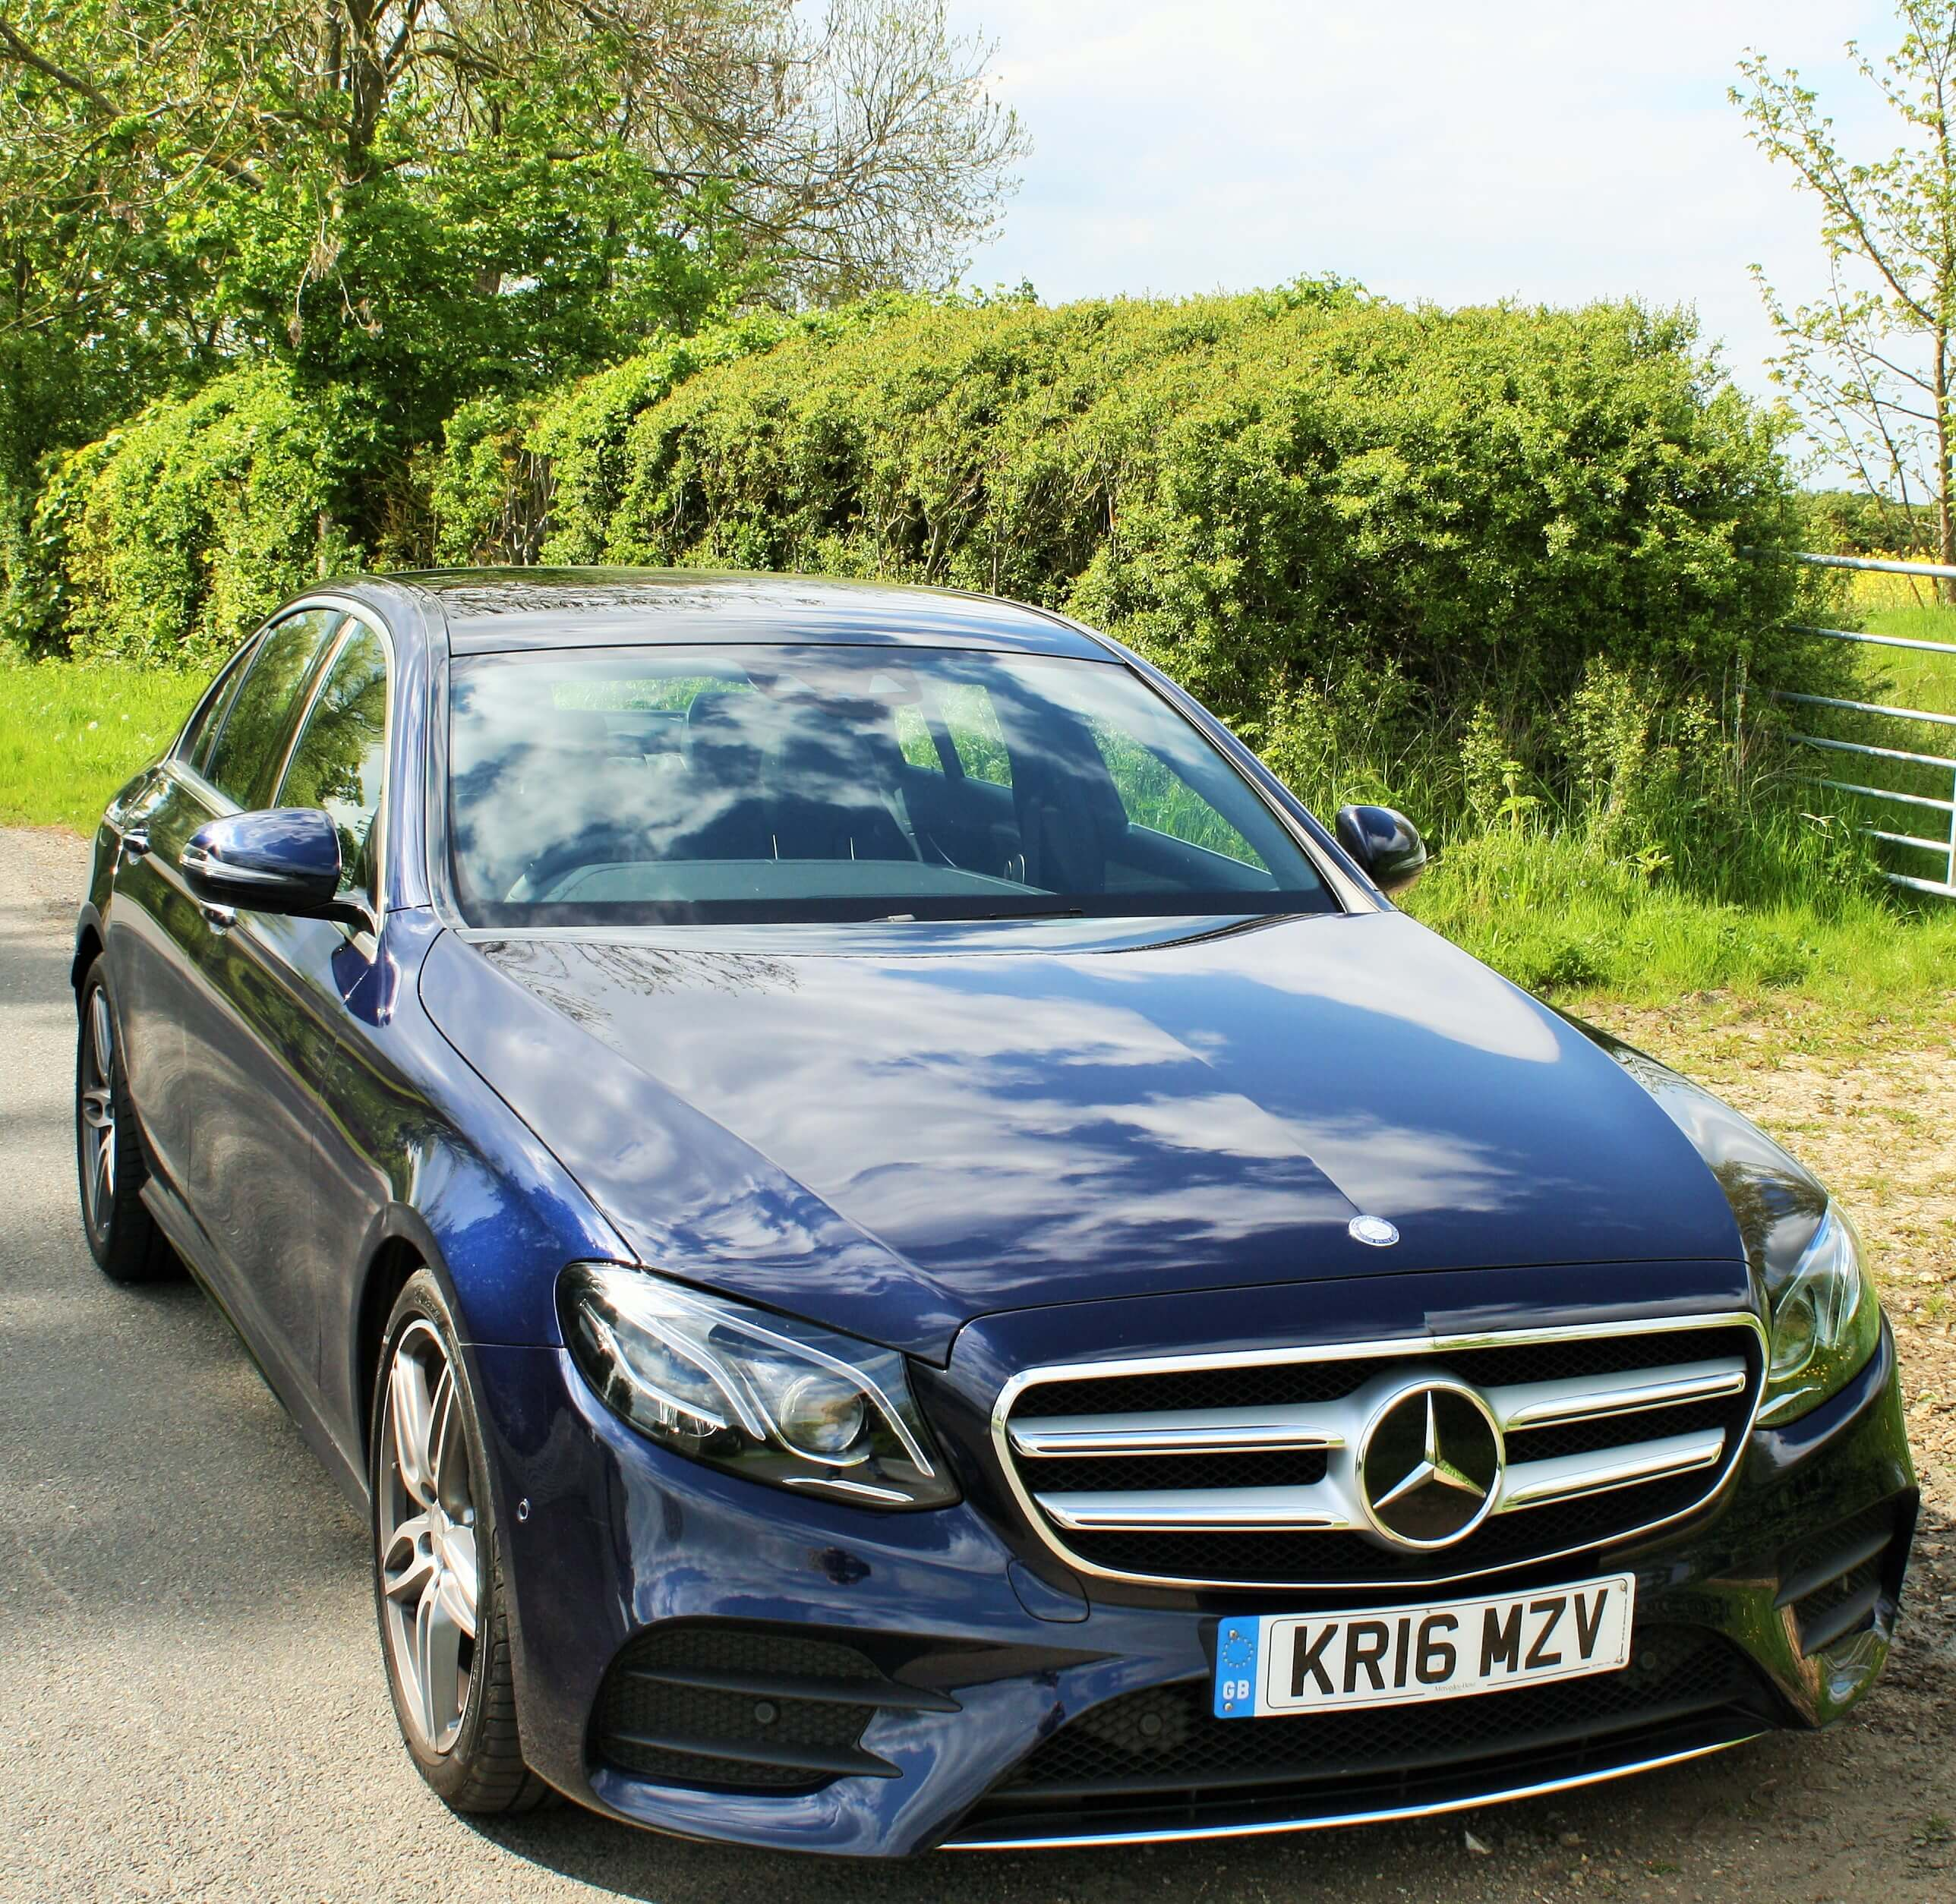 Mercedes benz e class saloon lease mercedes benz e class for Mercedes benz e class lease price